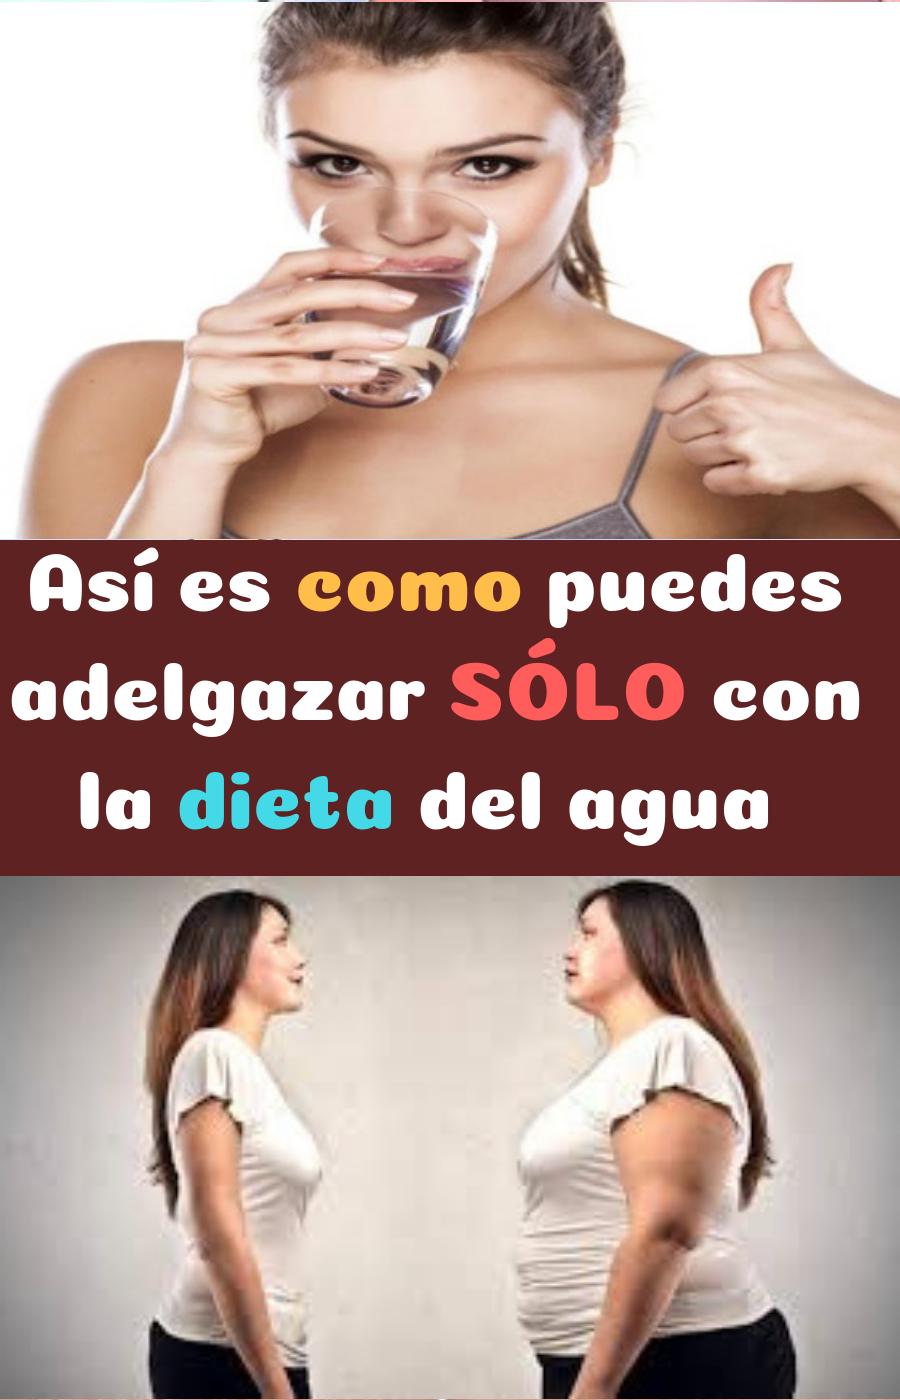 beber mucha agua adelgazar o engordan